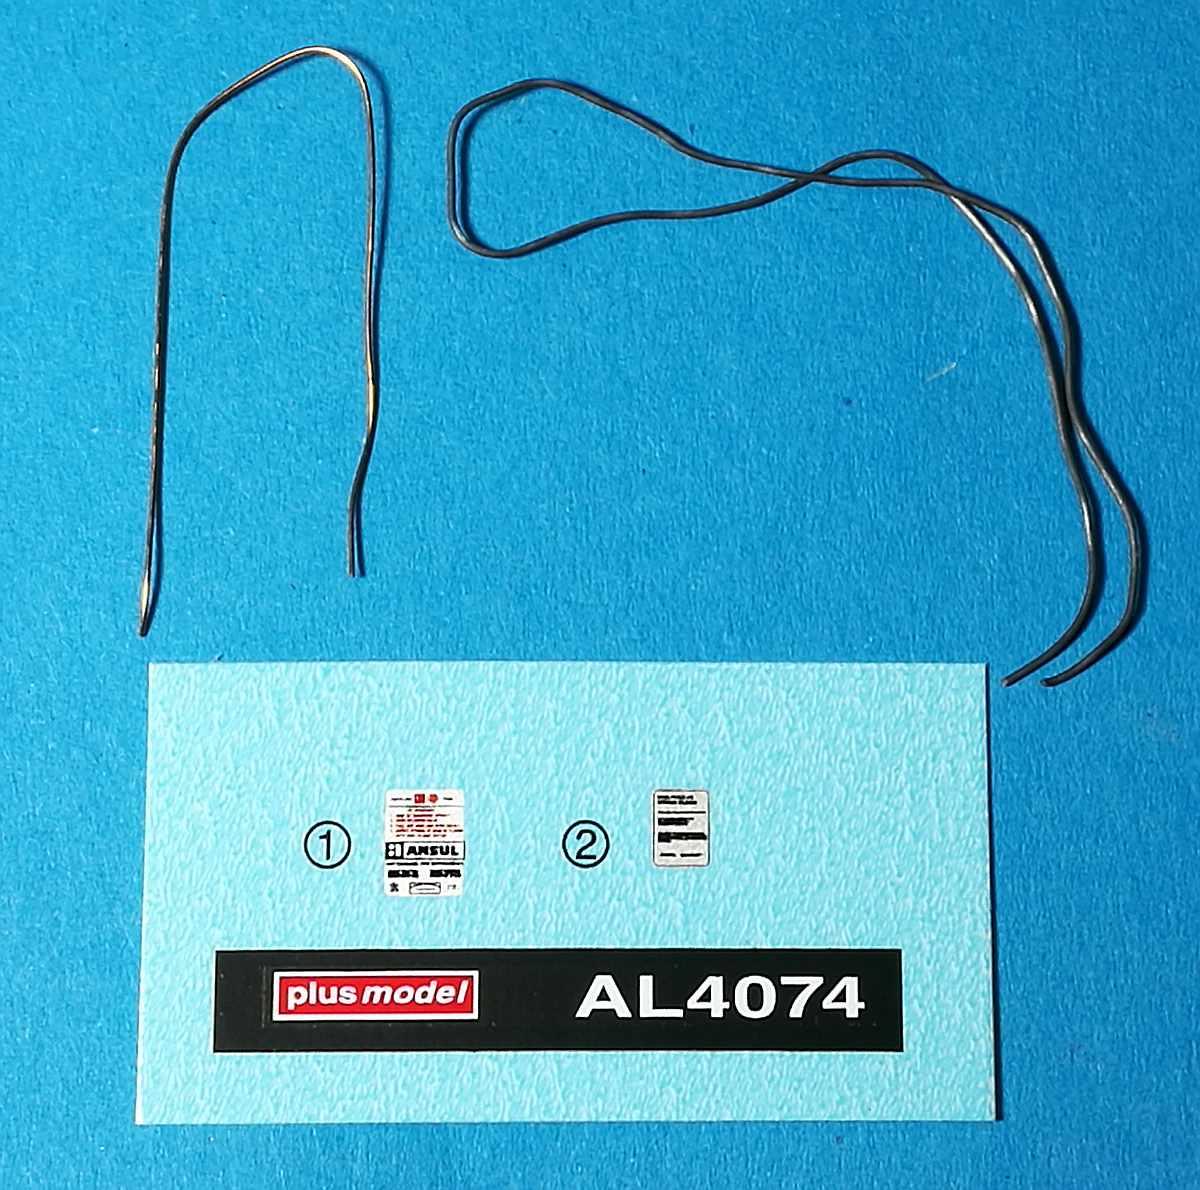 PlusModel-AL-4074-Wheel-Extinguisher-10 Wheel extinguisher im Maßstab 1:48 von PlusModel AL-4074